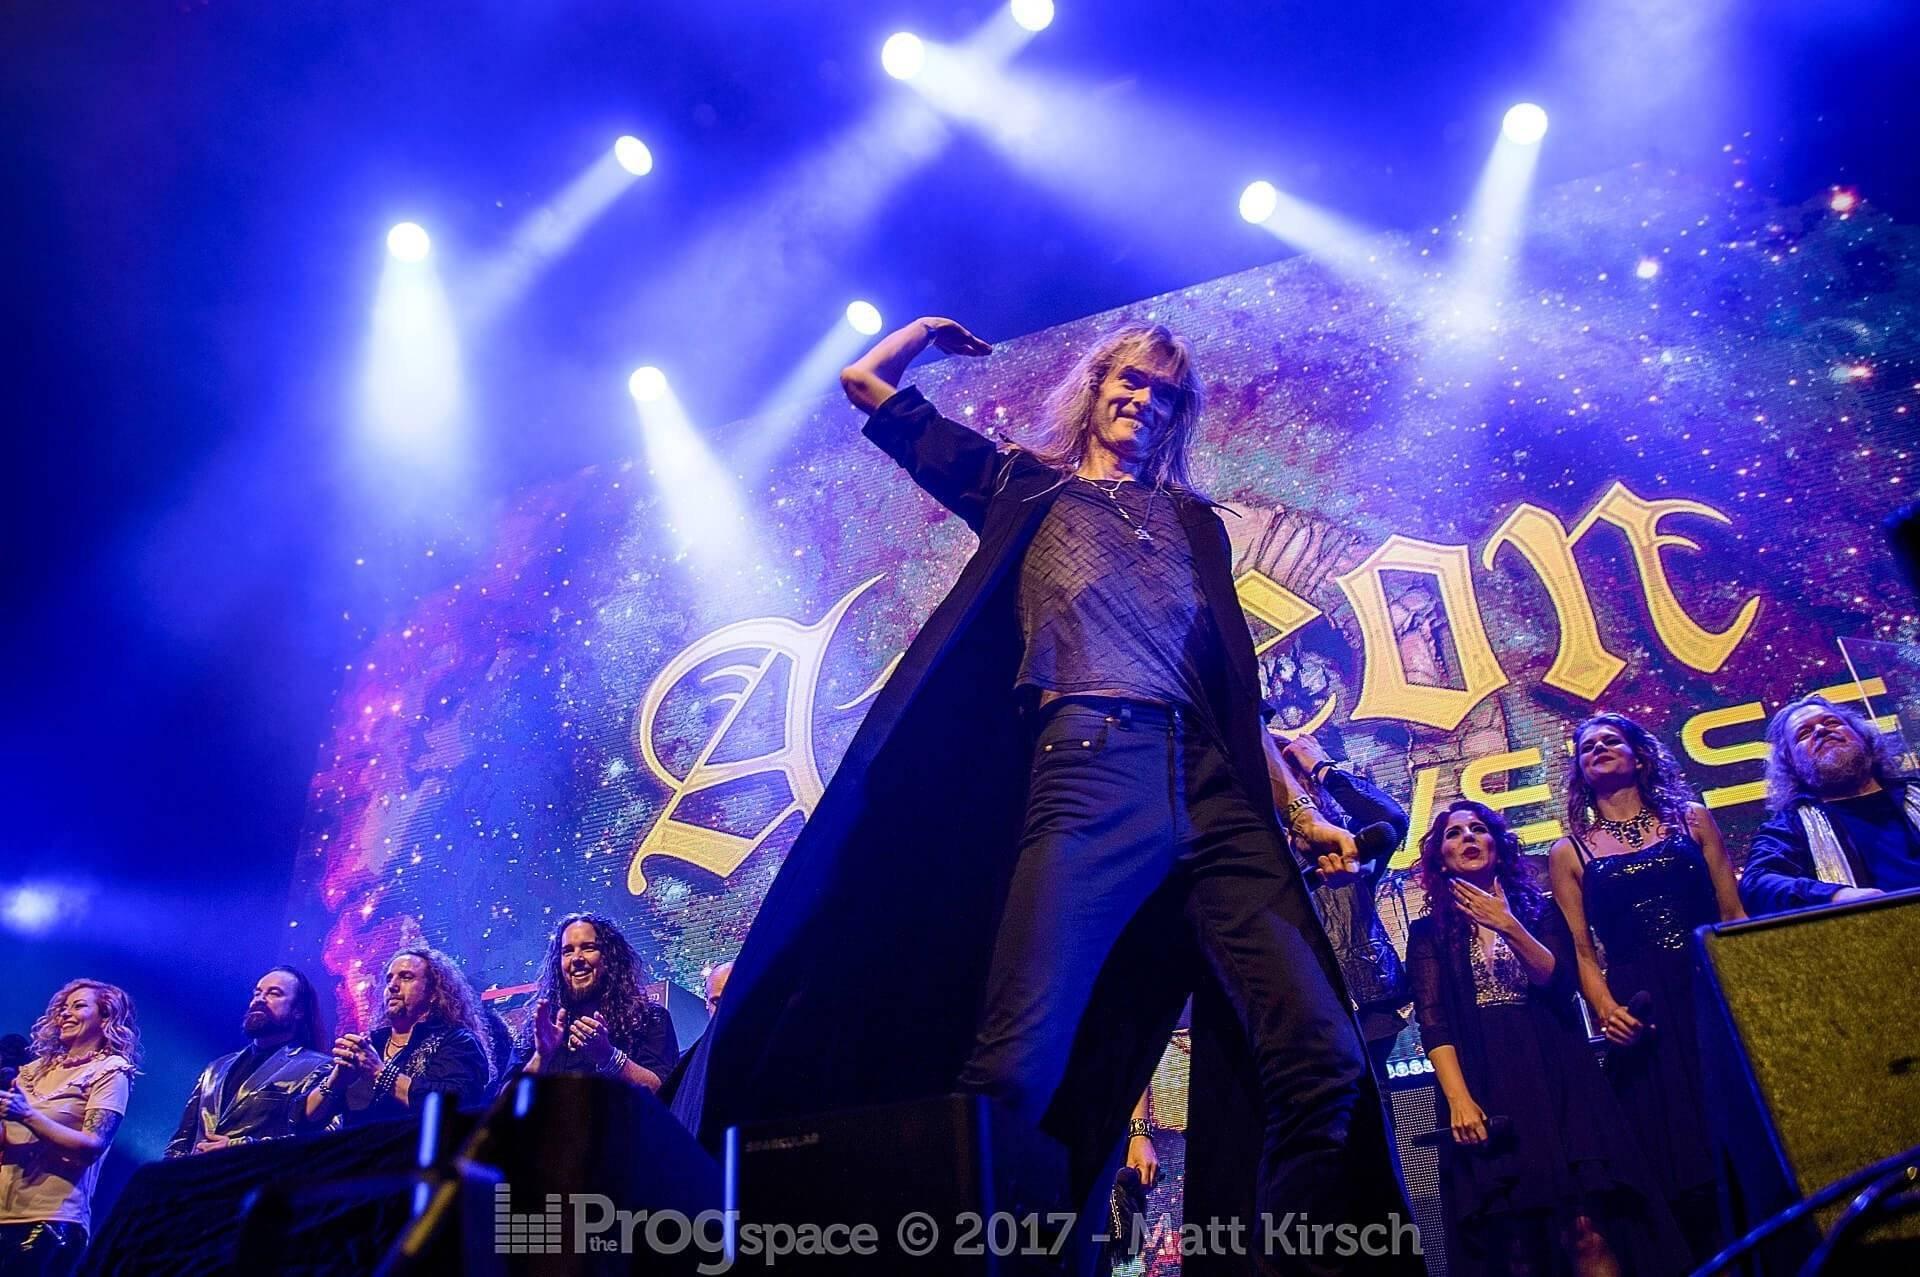 Ayreon Universe, live in Tilburg 15. September, 2017